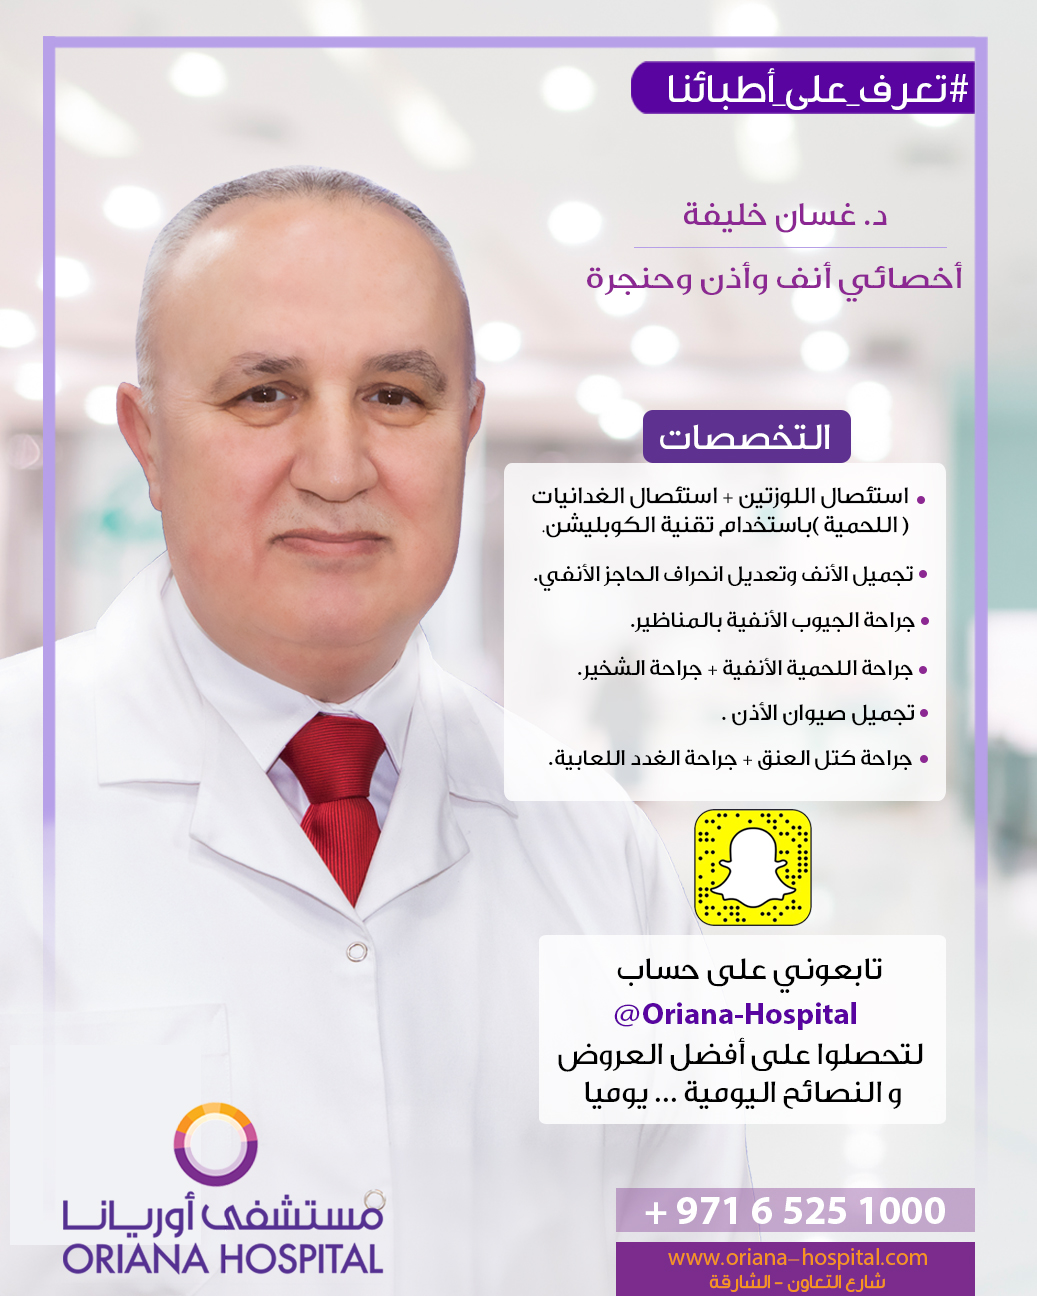 Dr Ghassan arabic copy